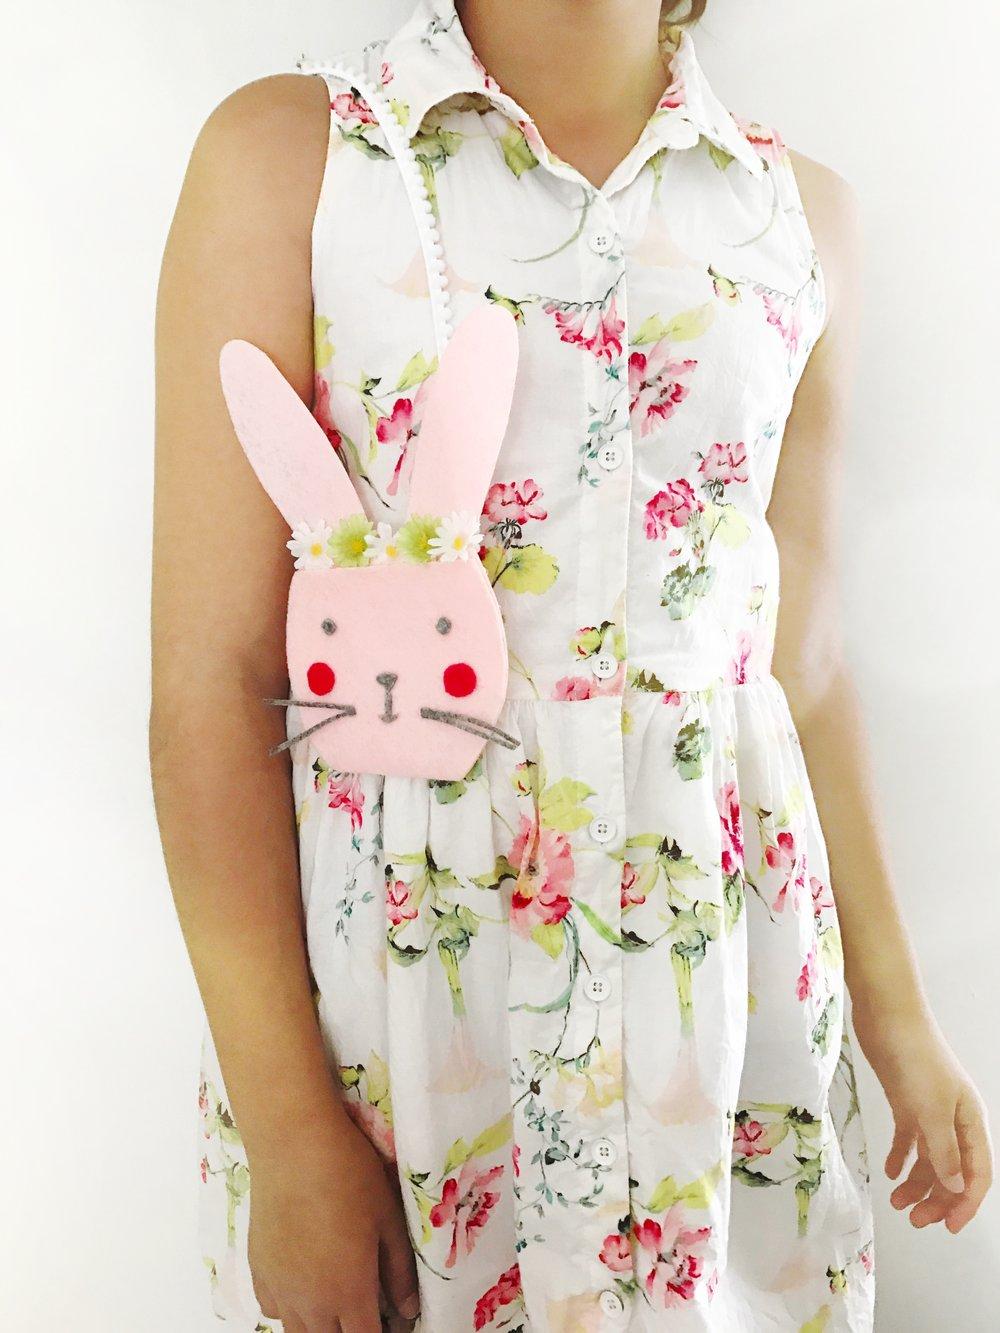 Bunny Purse 8